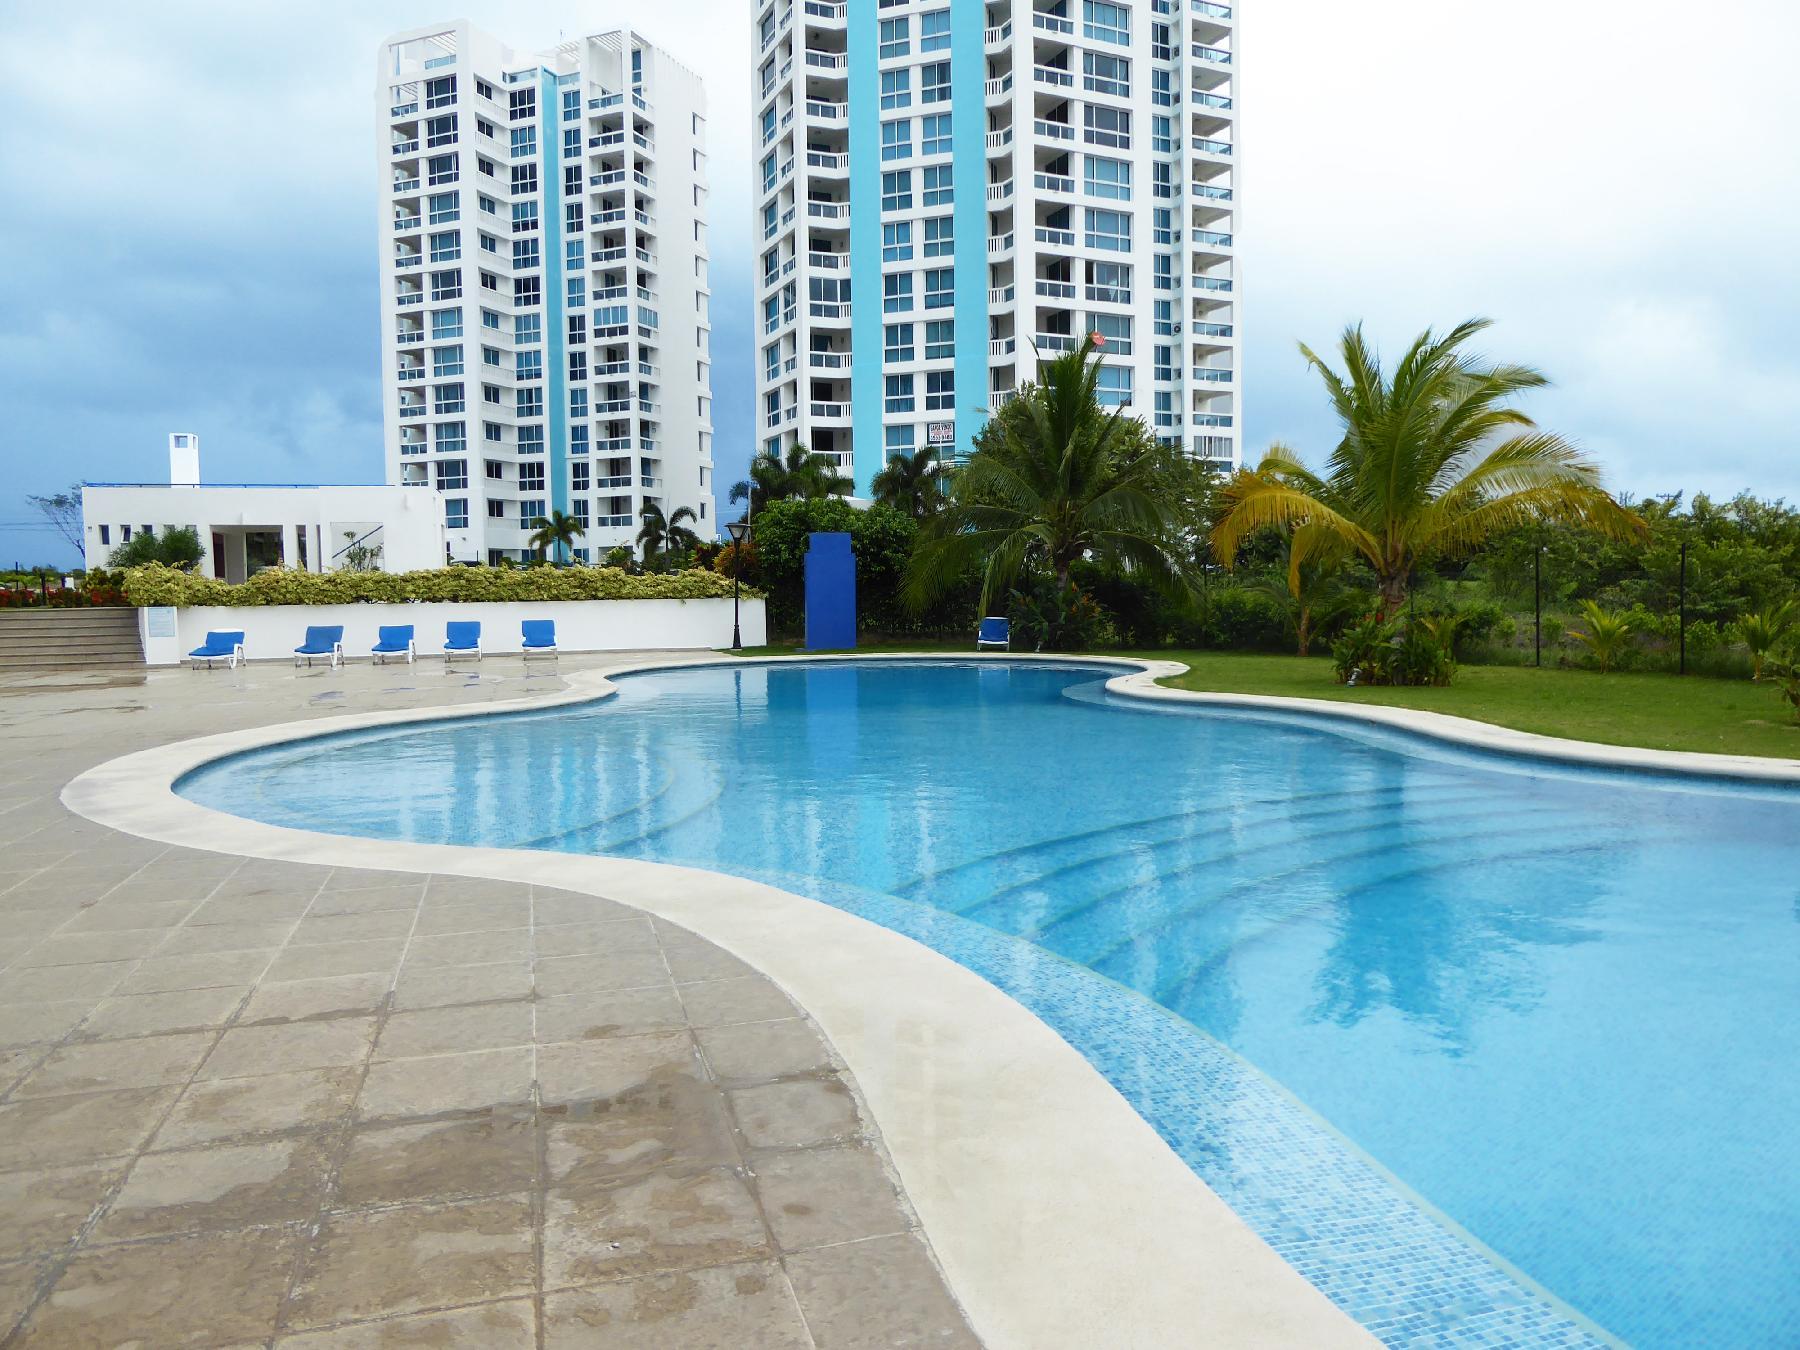 3 bedroom condo panama city beach trend home design and 3 bedroom apt condo rental in panama city beach florida